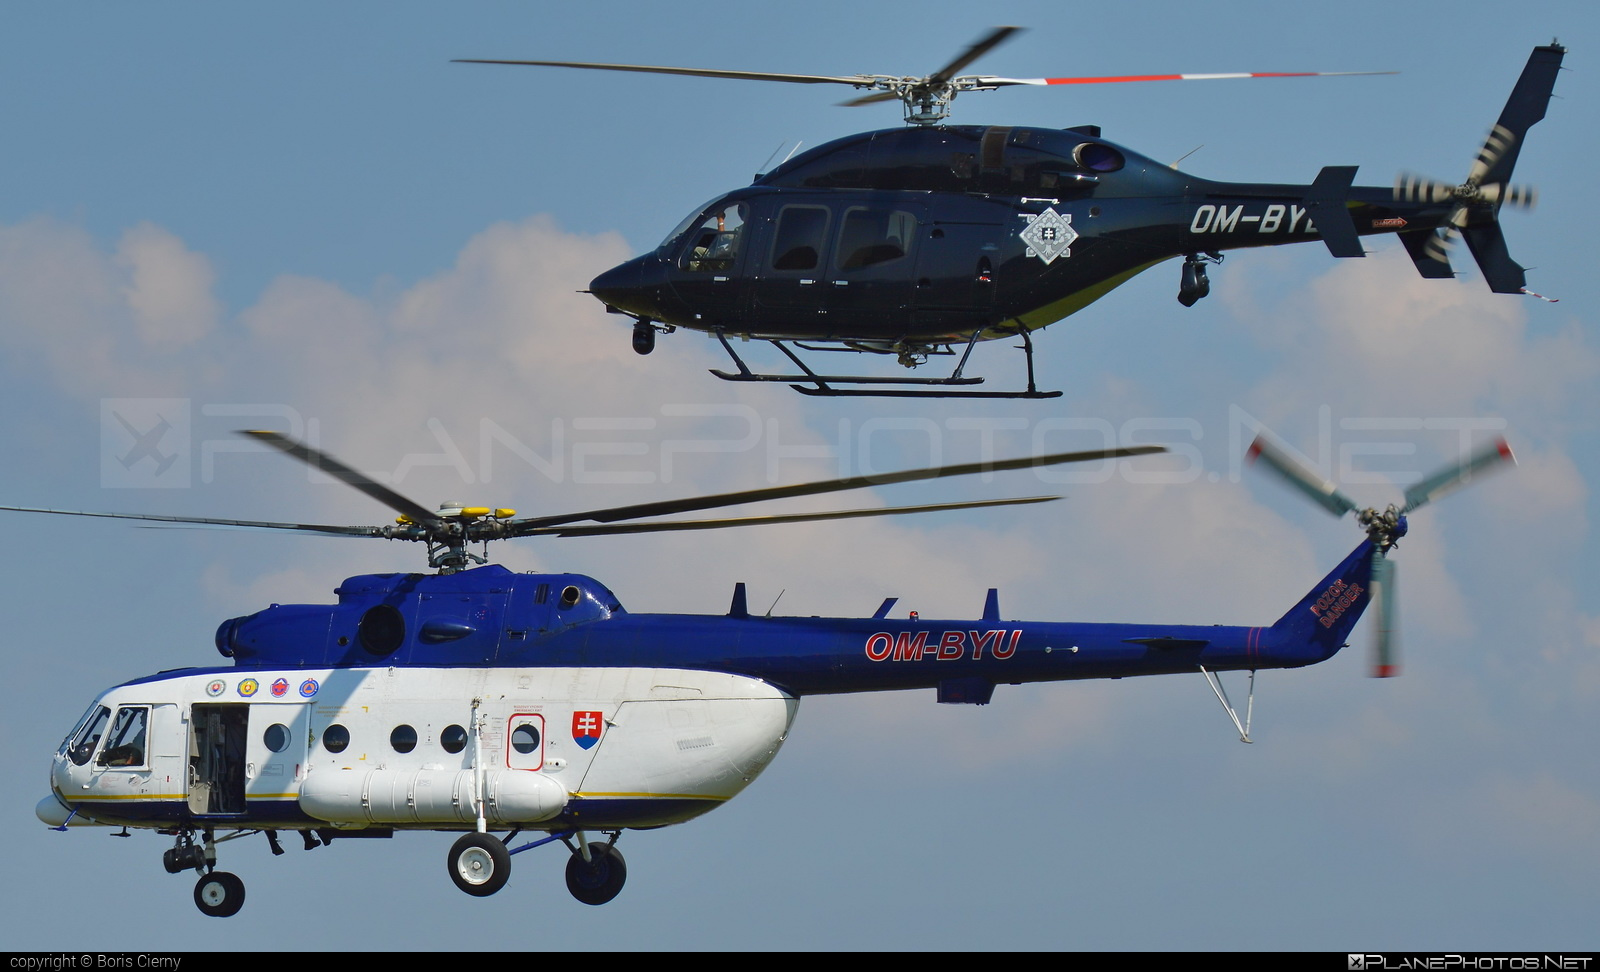 Mil Mi-171 - OM-BYU operated by Letecký útvar MV SR (Slovak Government Flying Service) #mi171 #mil #mil171 #milhelicopters